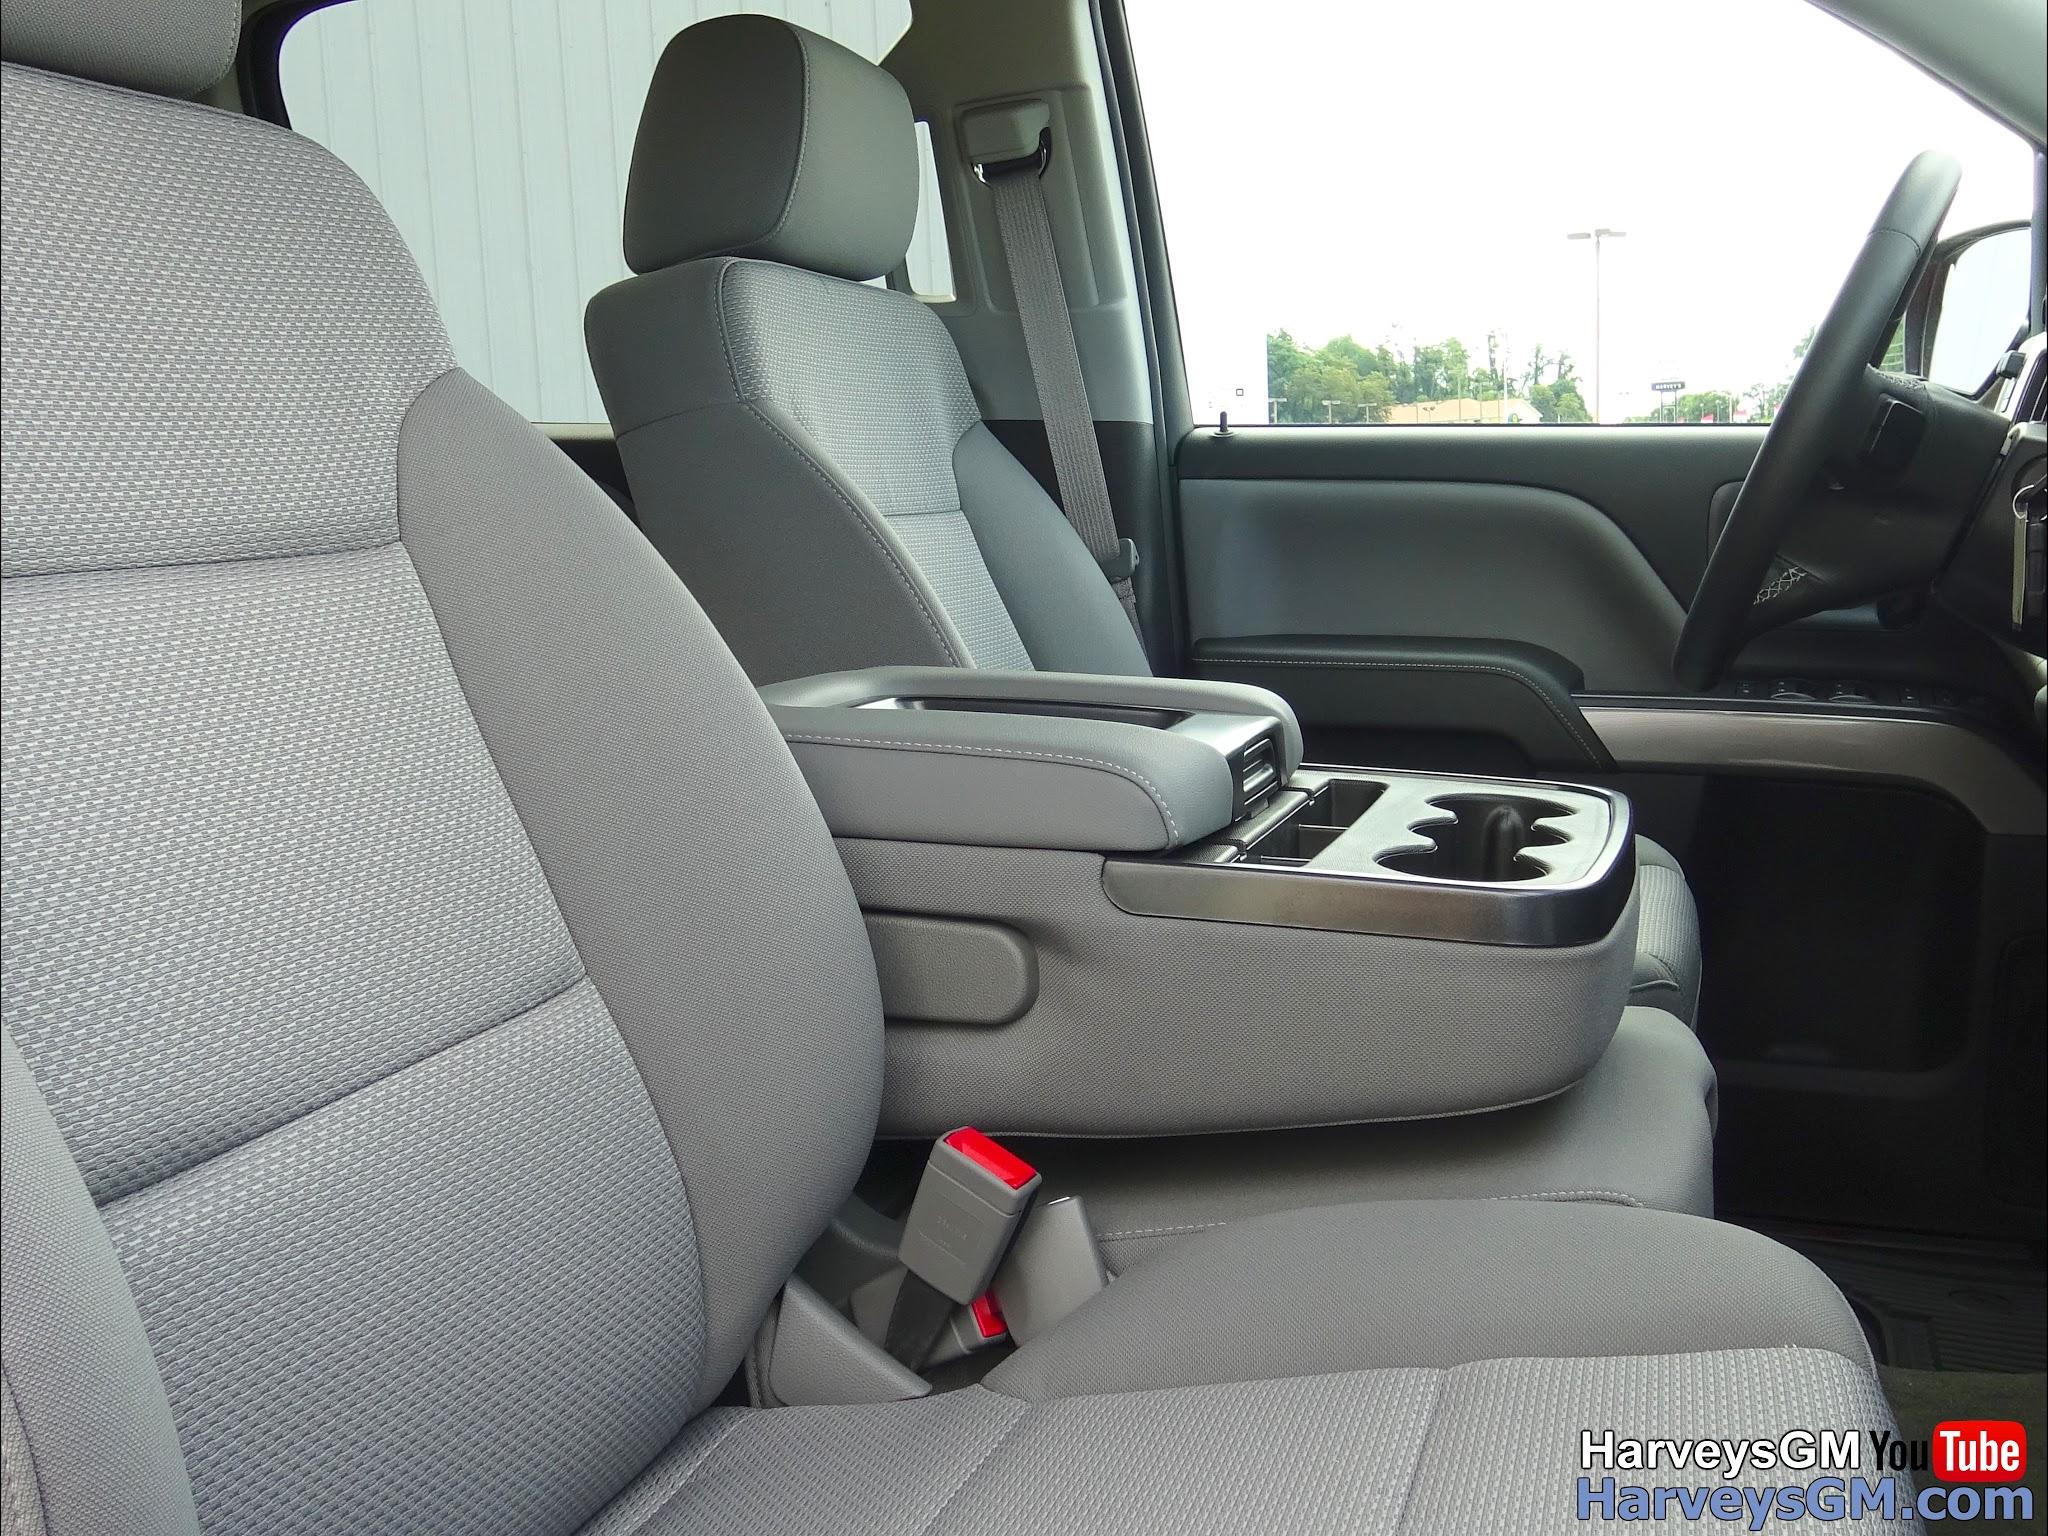 2015 Chevy Silverado 1500 Crew Cab Short Box 4wd Lt With 2lt Gm Trailer Brake Wiring Victory Red